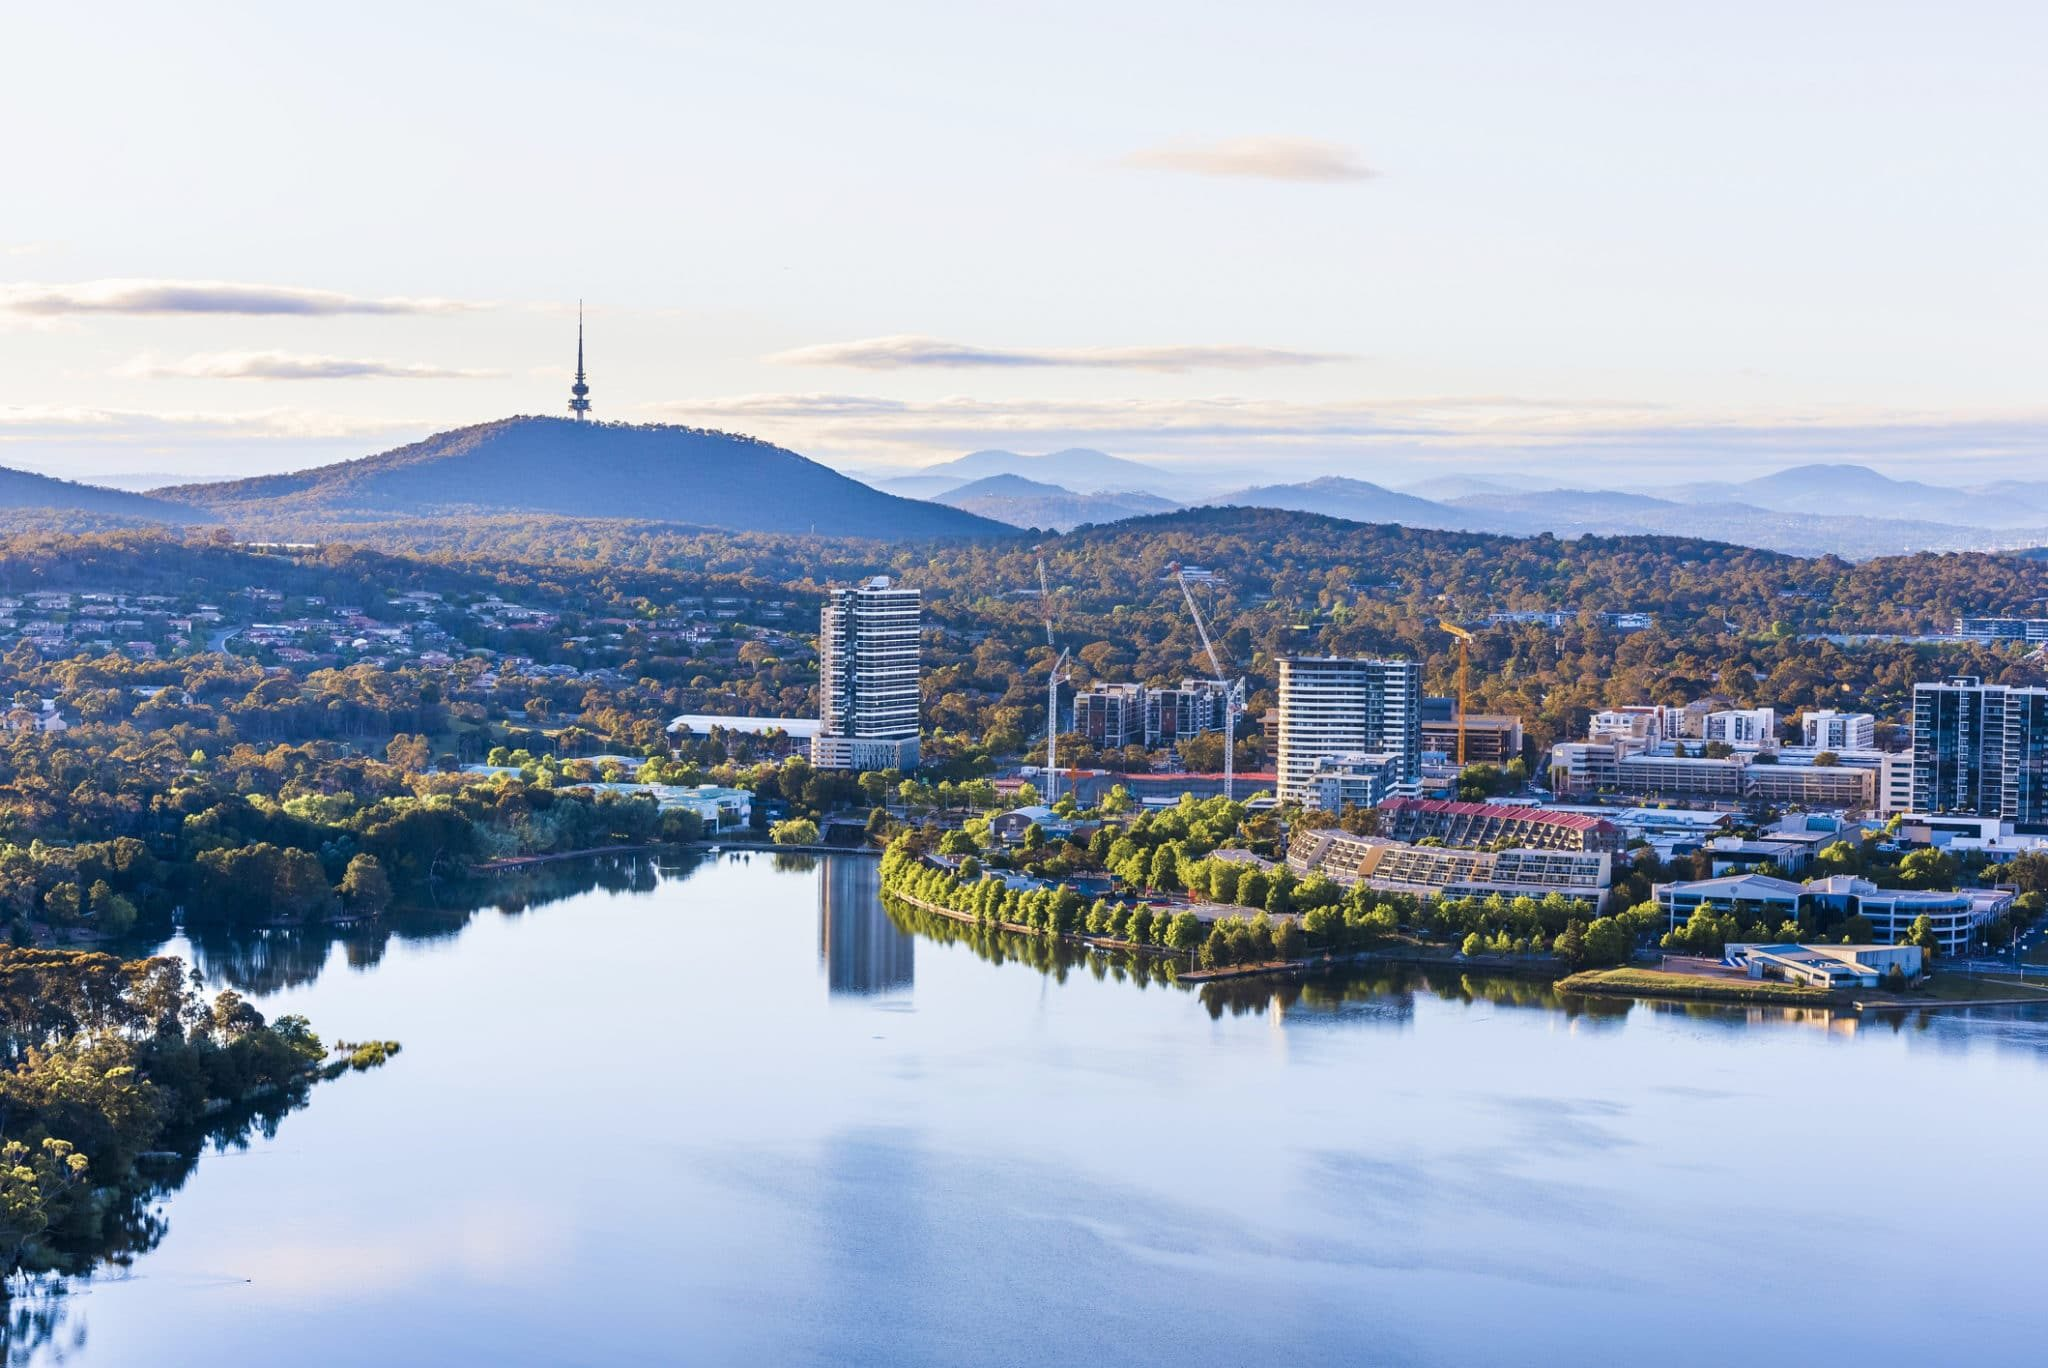 Conference: Universities Australia 2020